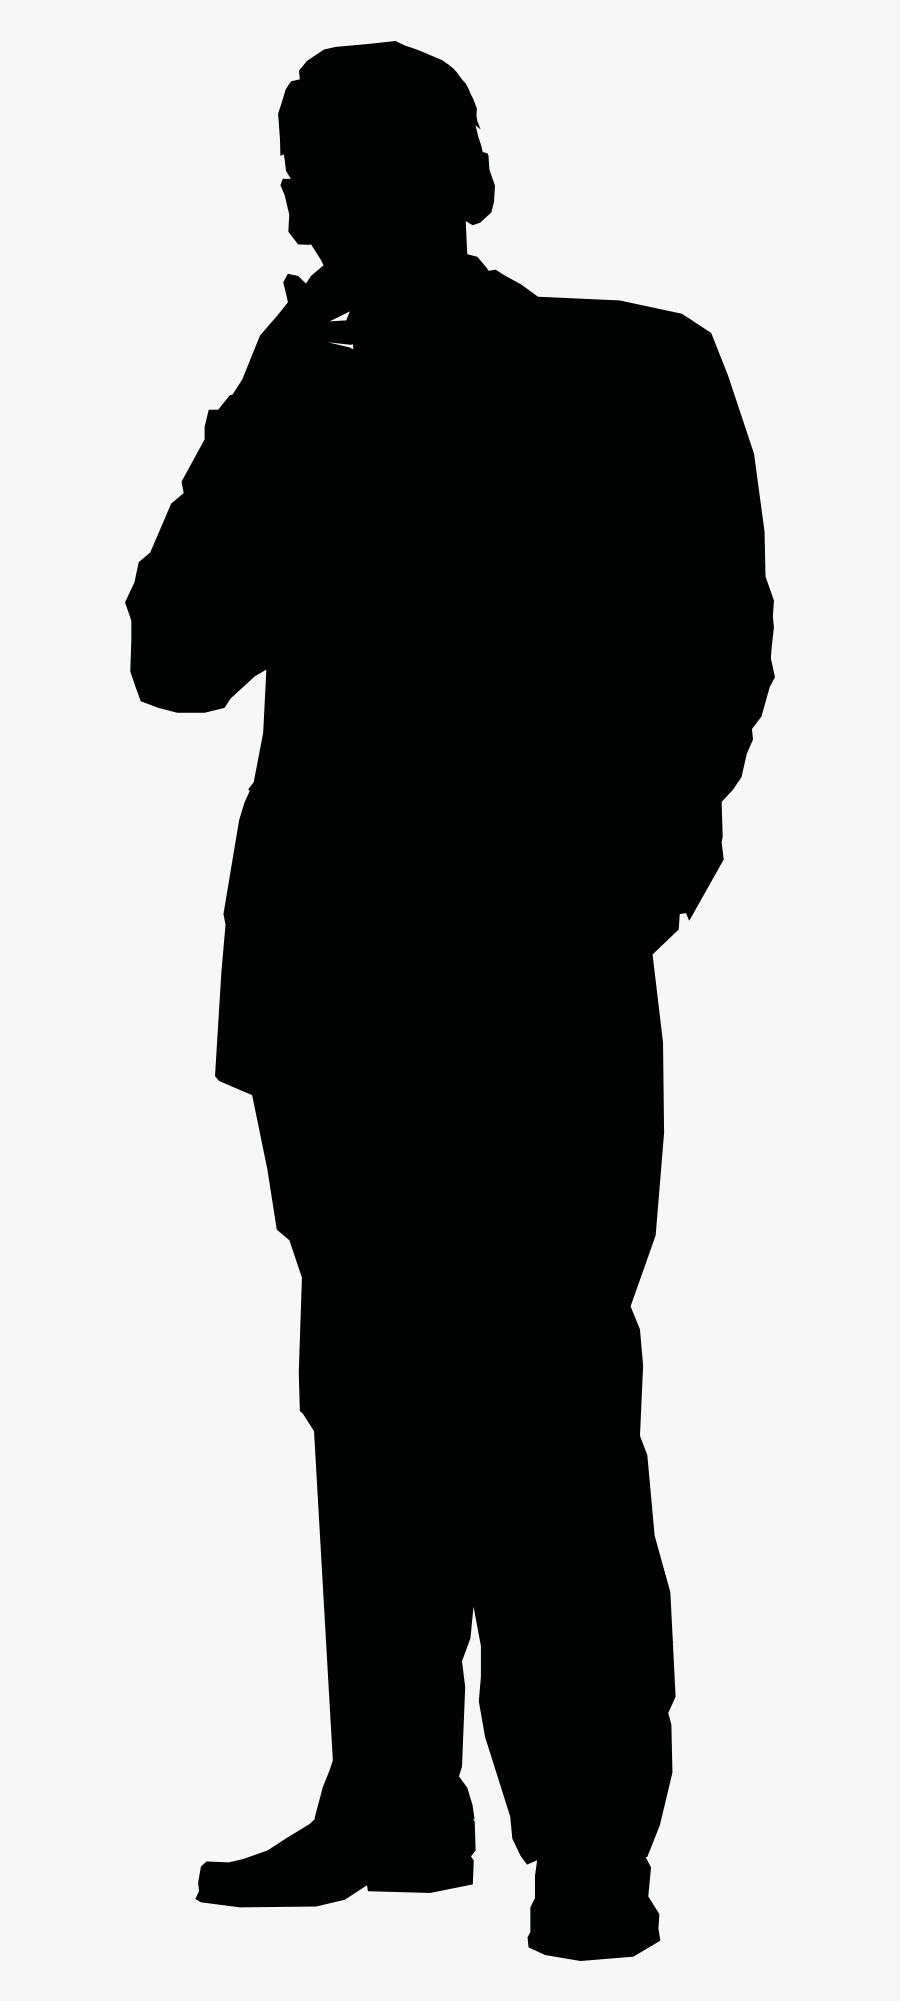 Silhouette Stick Figure Clip Art - Thinking Person, Transparent Clipart